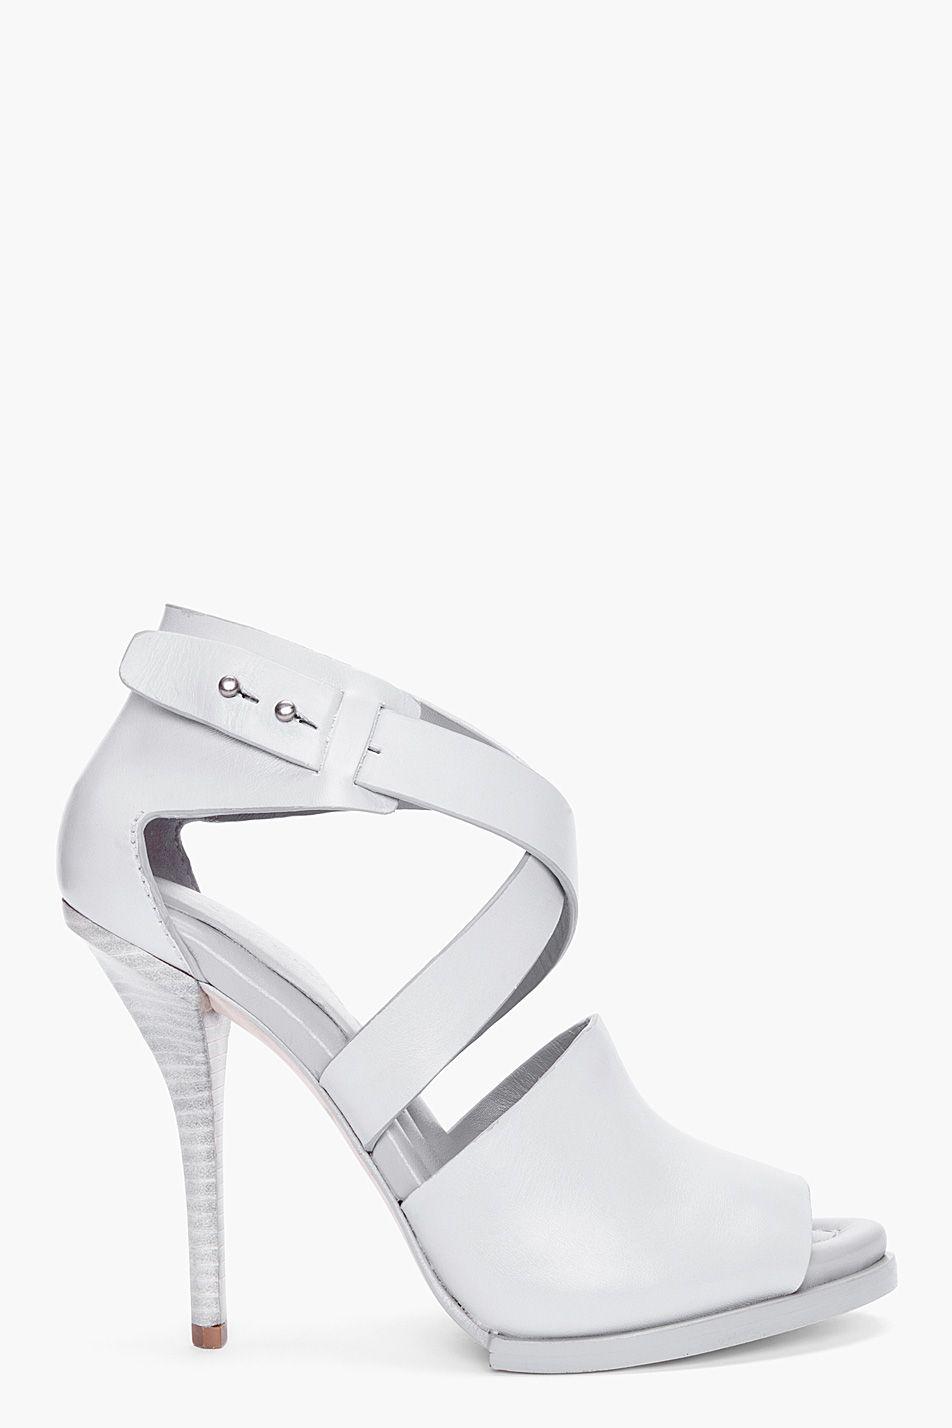 ALEXANDER WANG Grey Delphine Oyster Heels